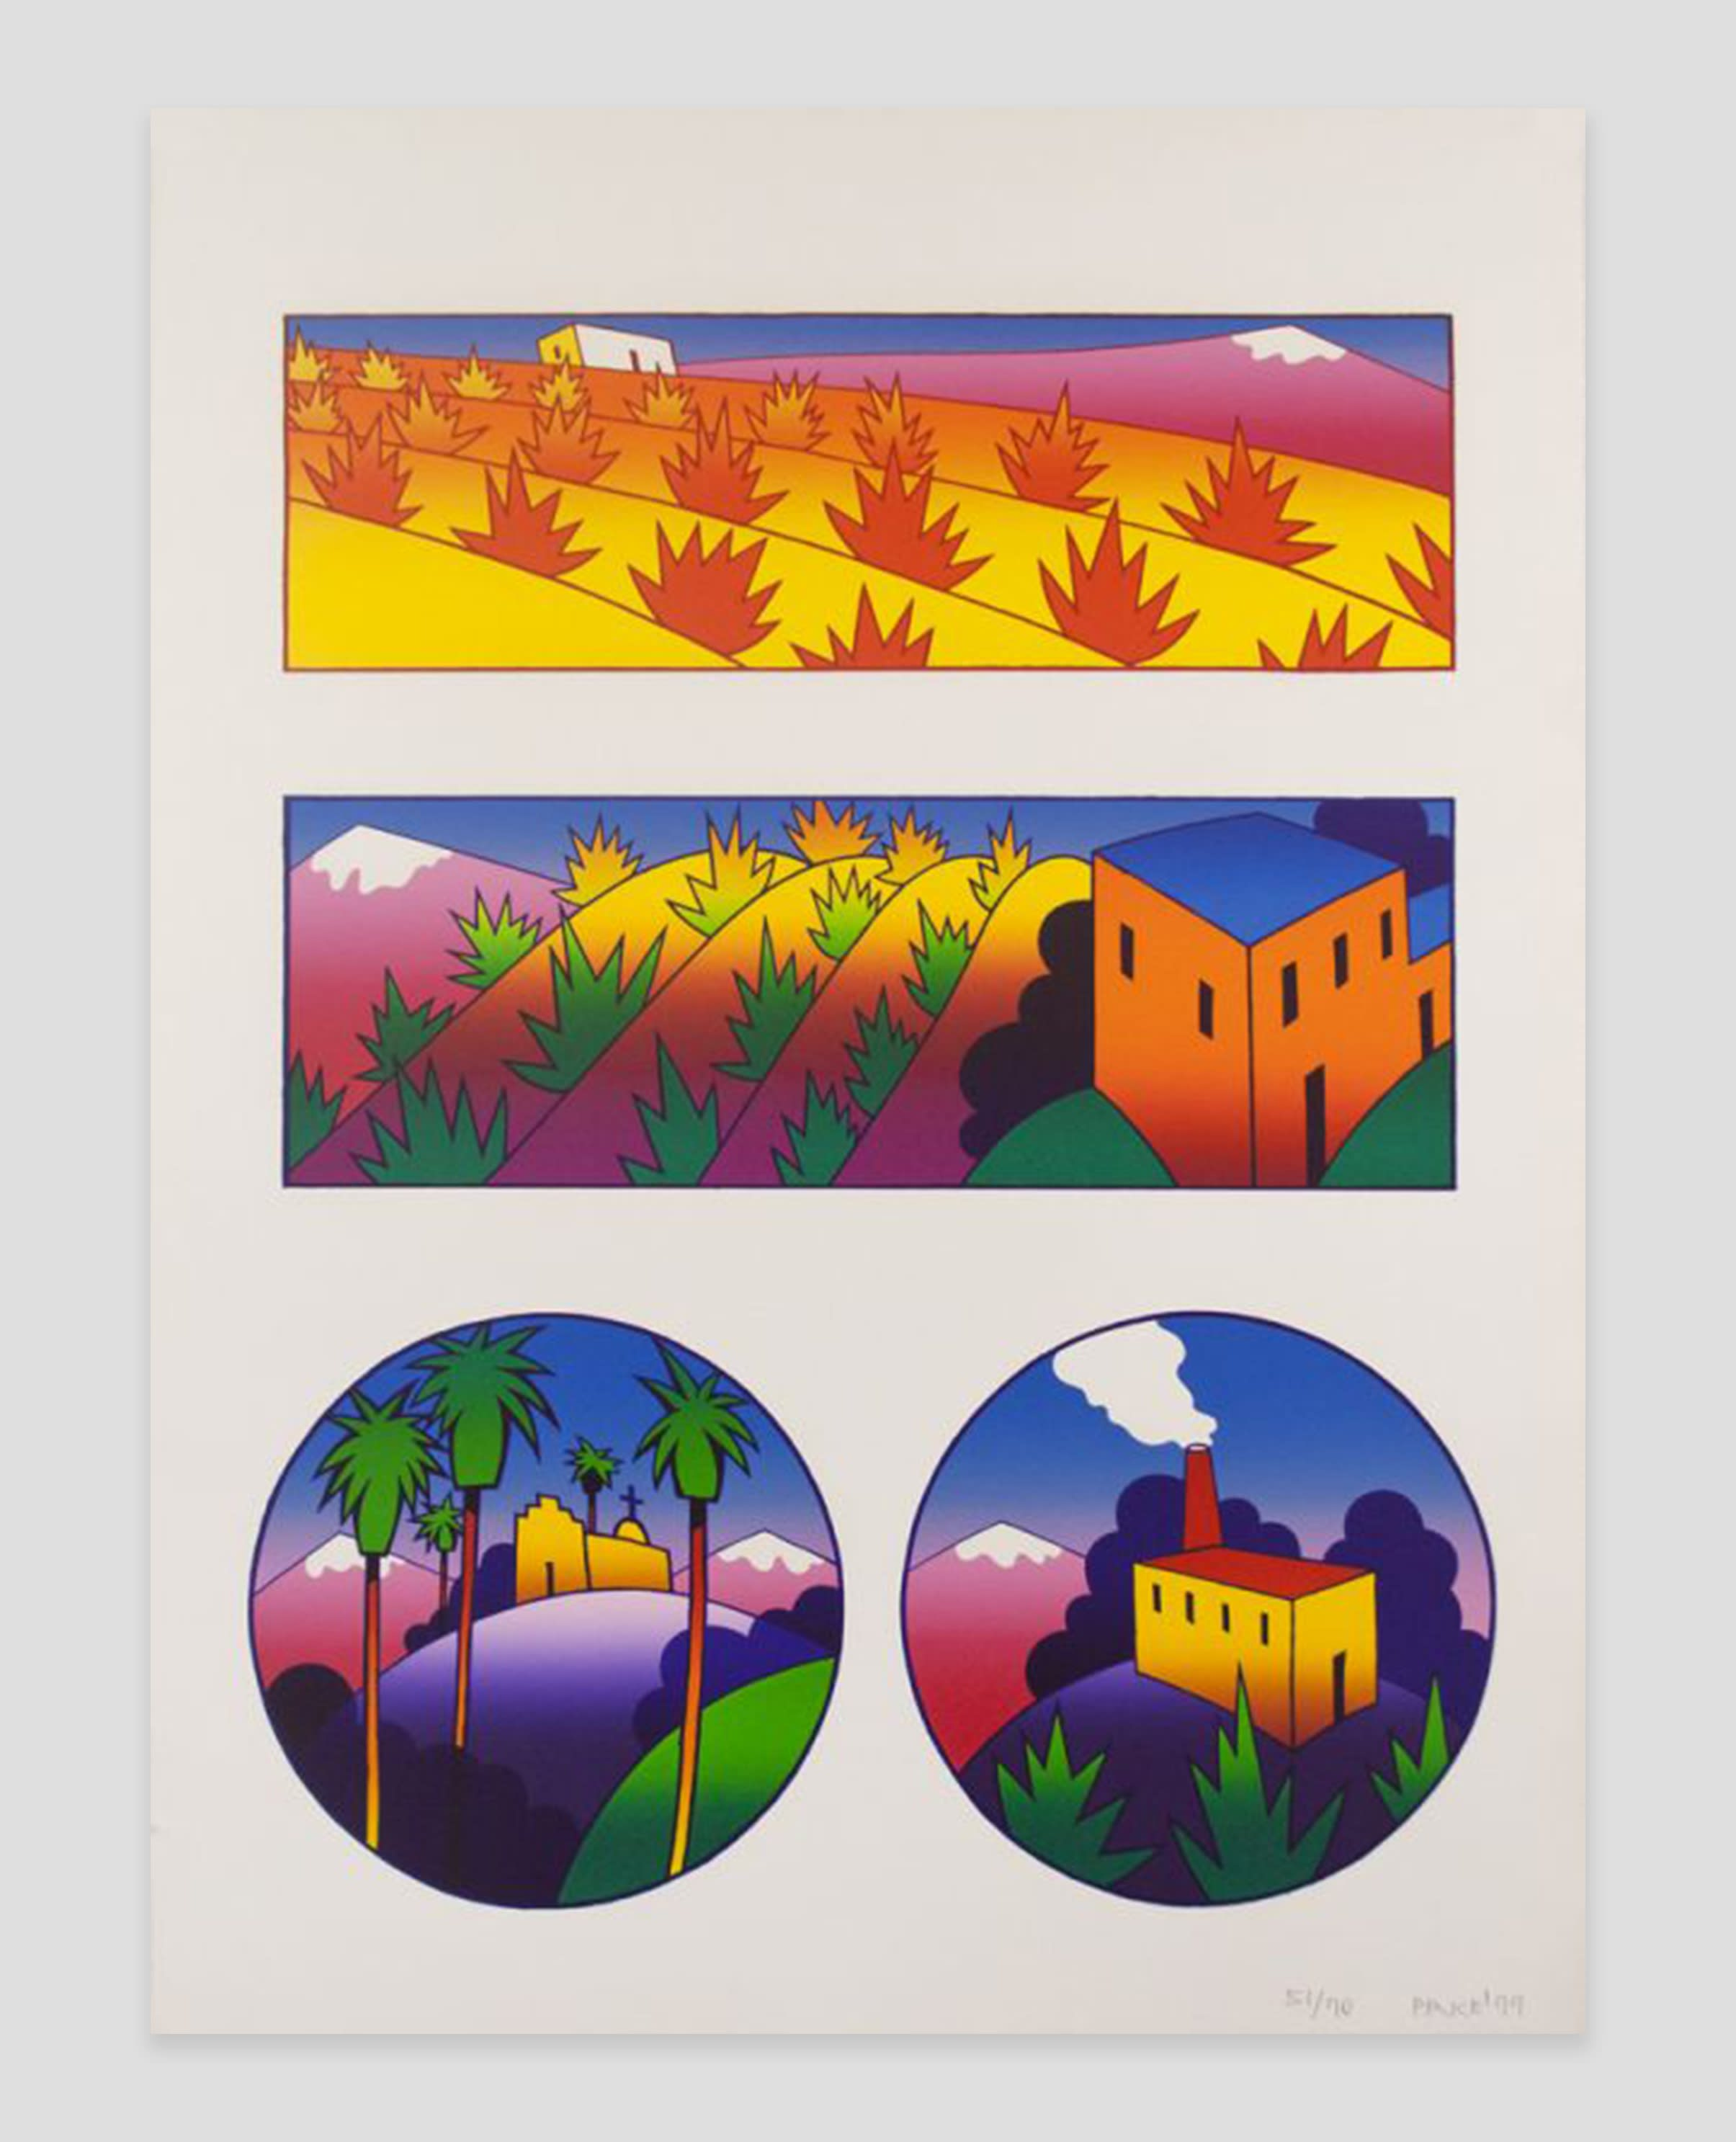 Fine Art Print by Ken Price at Zane Bennett Contemporary Art